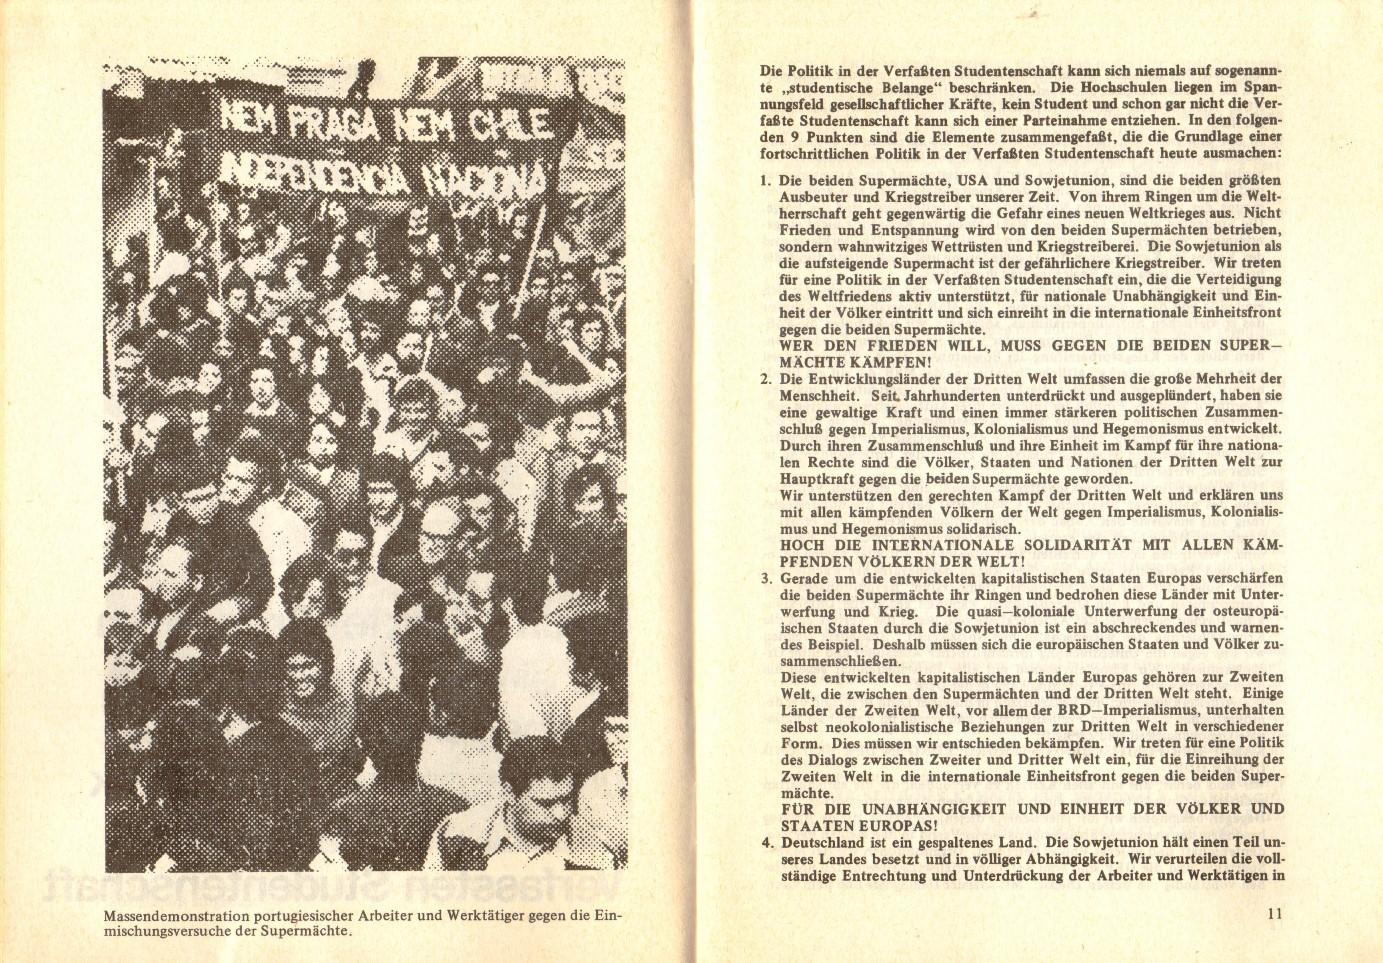 KSV_1976_Verfasste_Studentenschaft_07